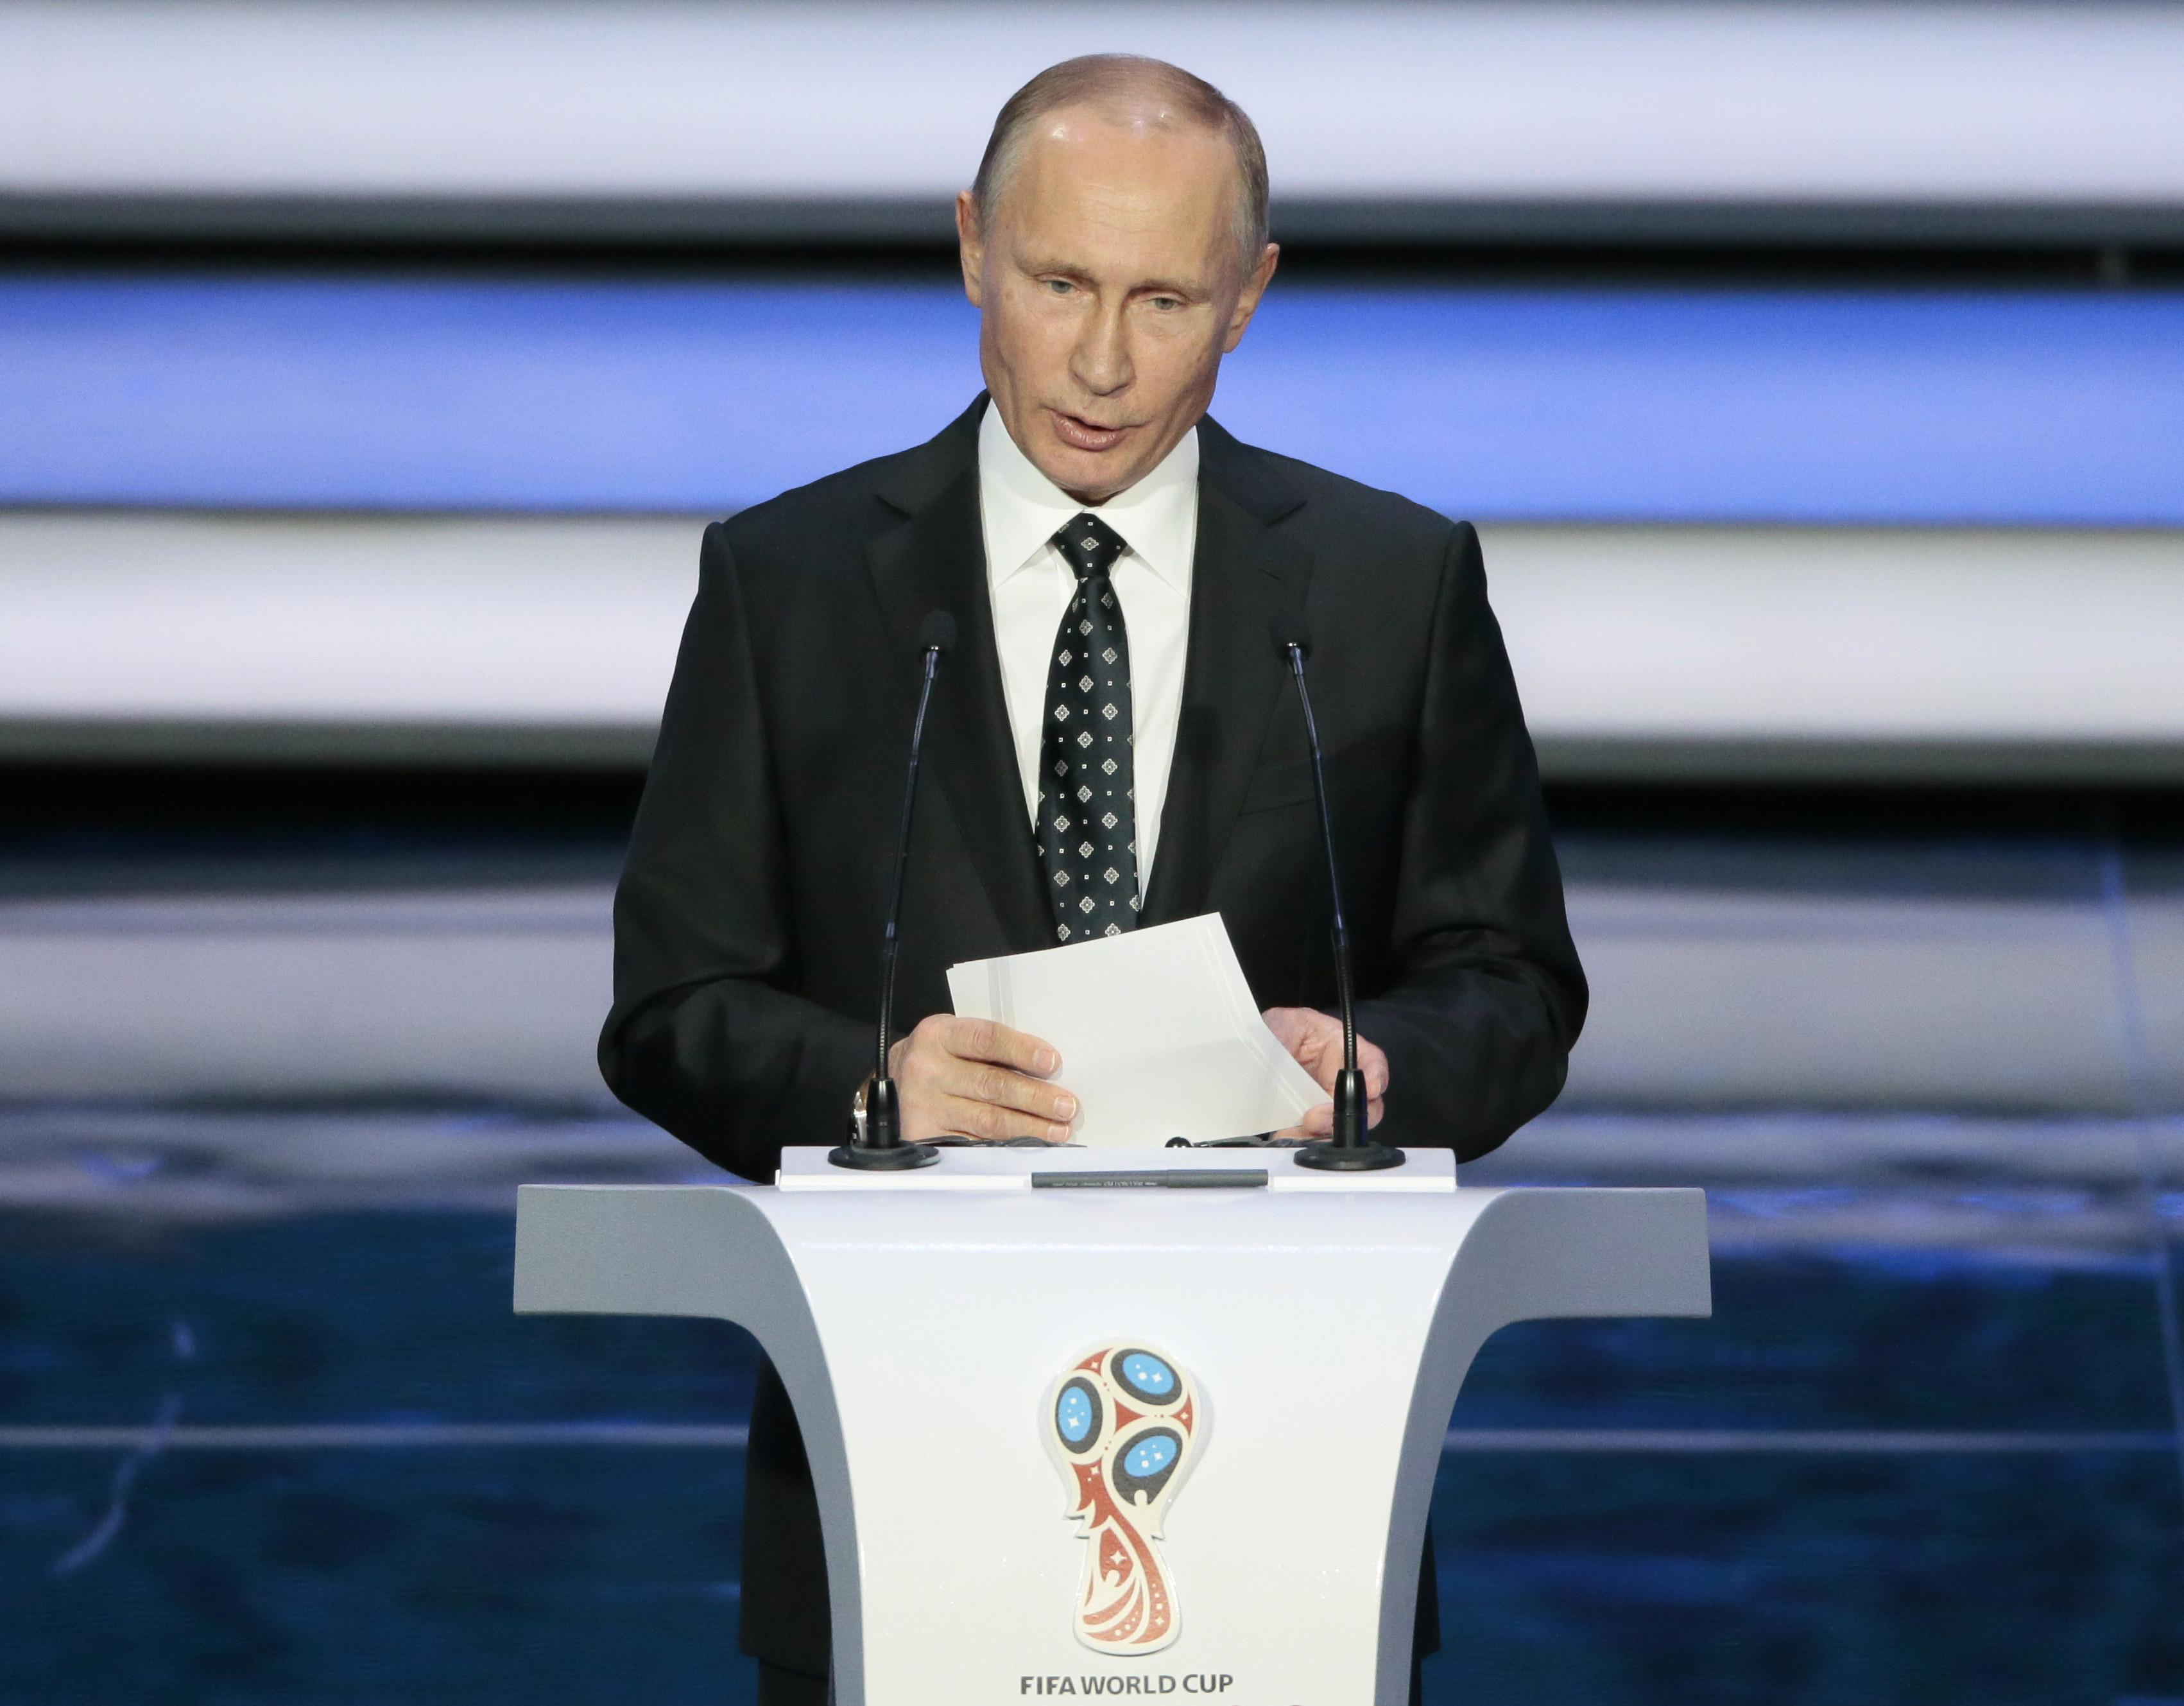 Putin urged to form a monetary union of Russia, Kazakhstan and Belarus 03/20/2015 53